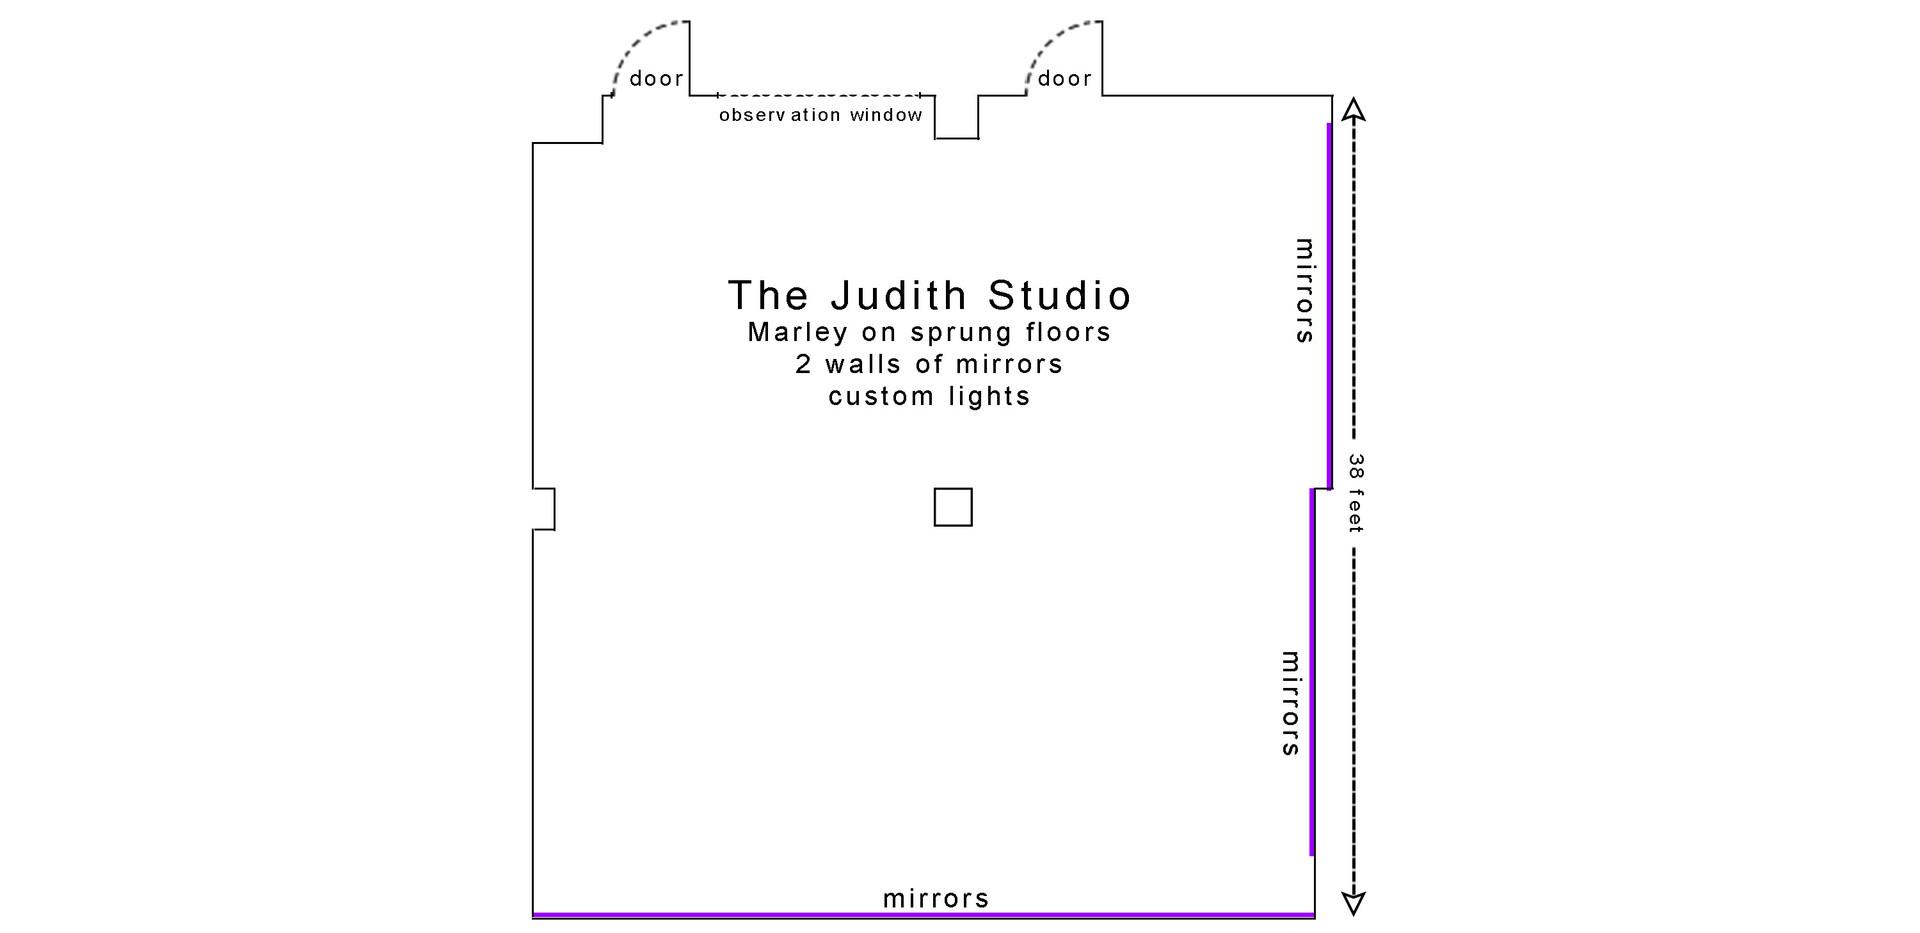 floorplan Judith